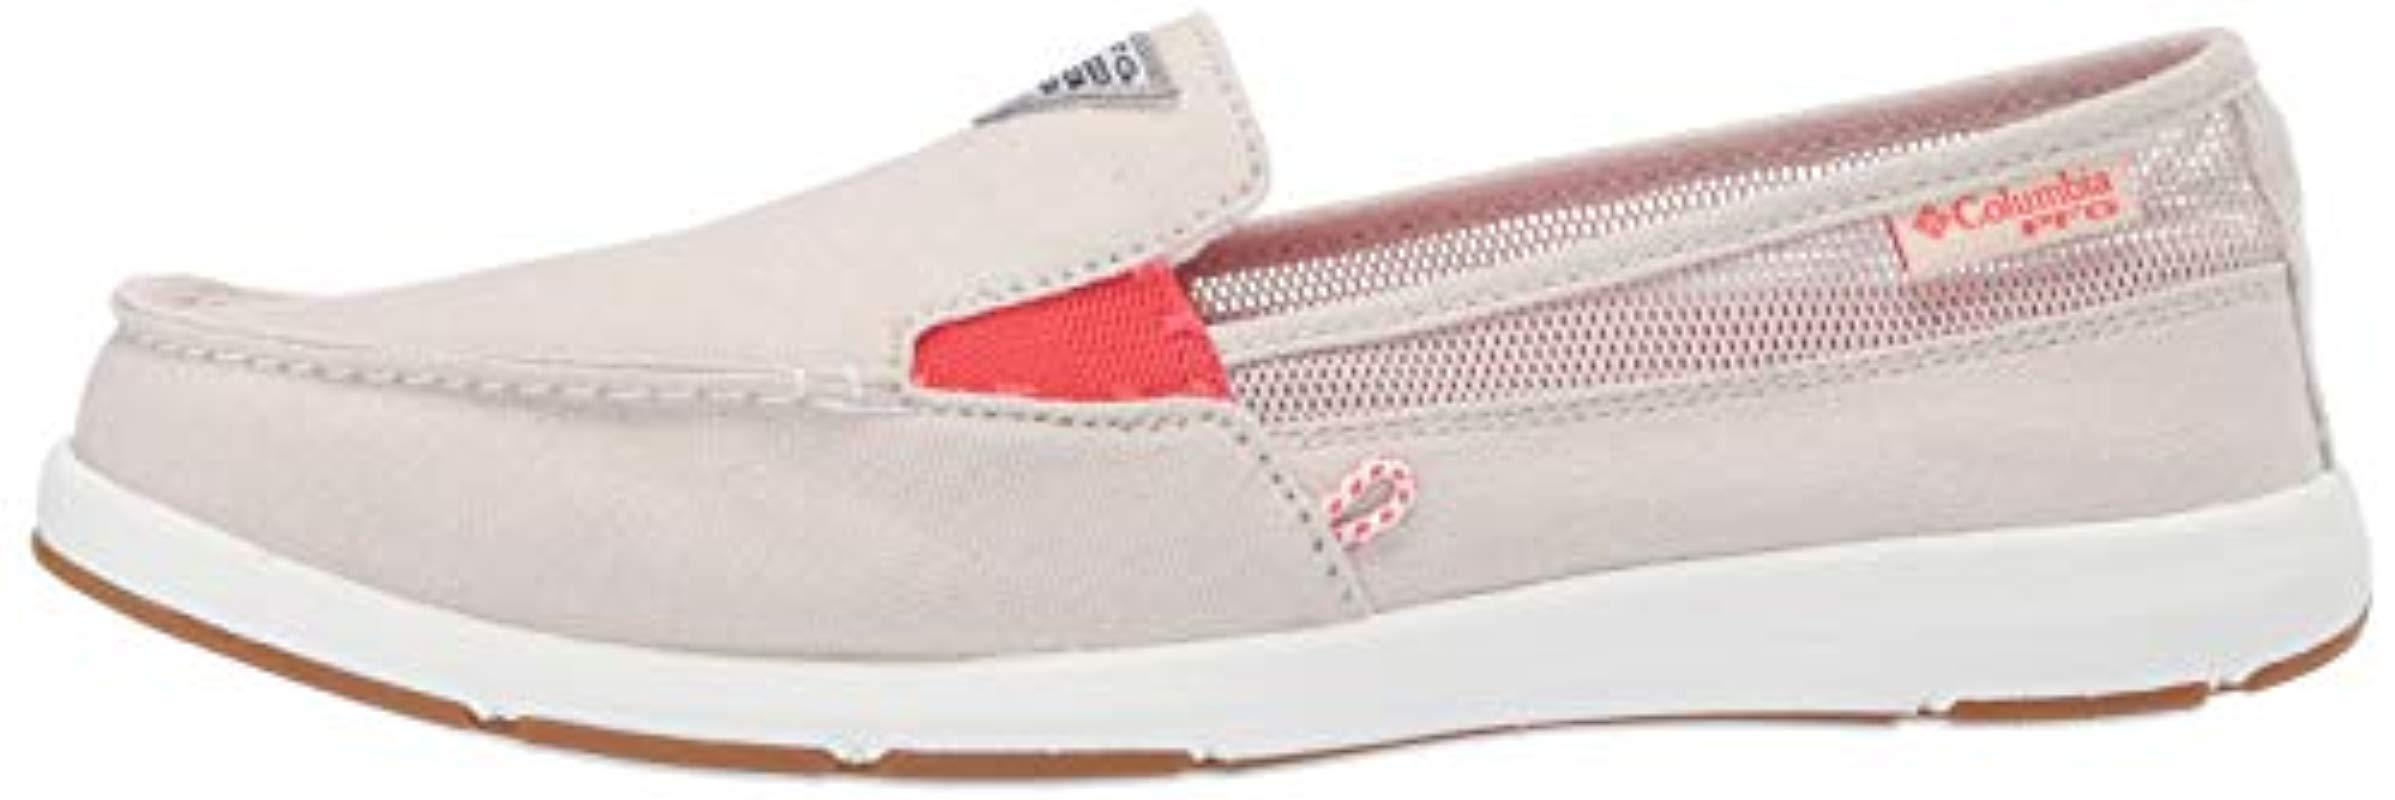 NEW Columbia Women's Flats Delray II Slip On PFG Canvas Comfort Boat Shoes